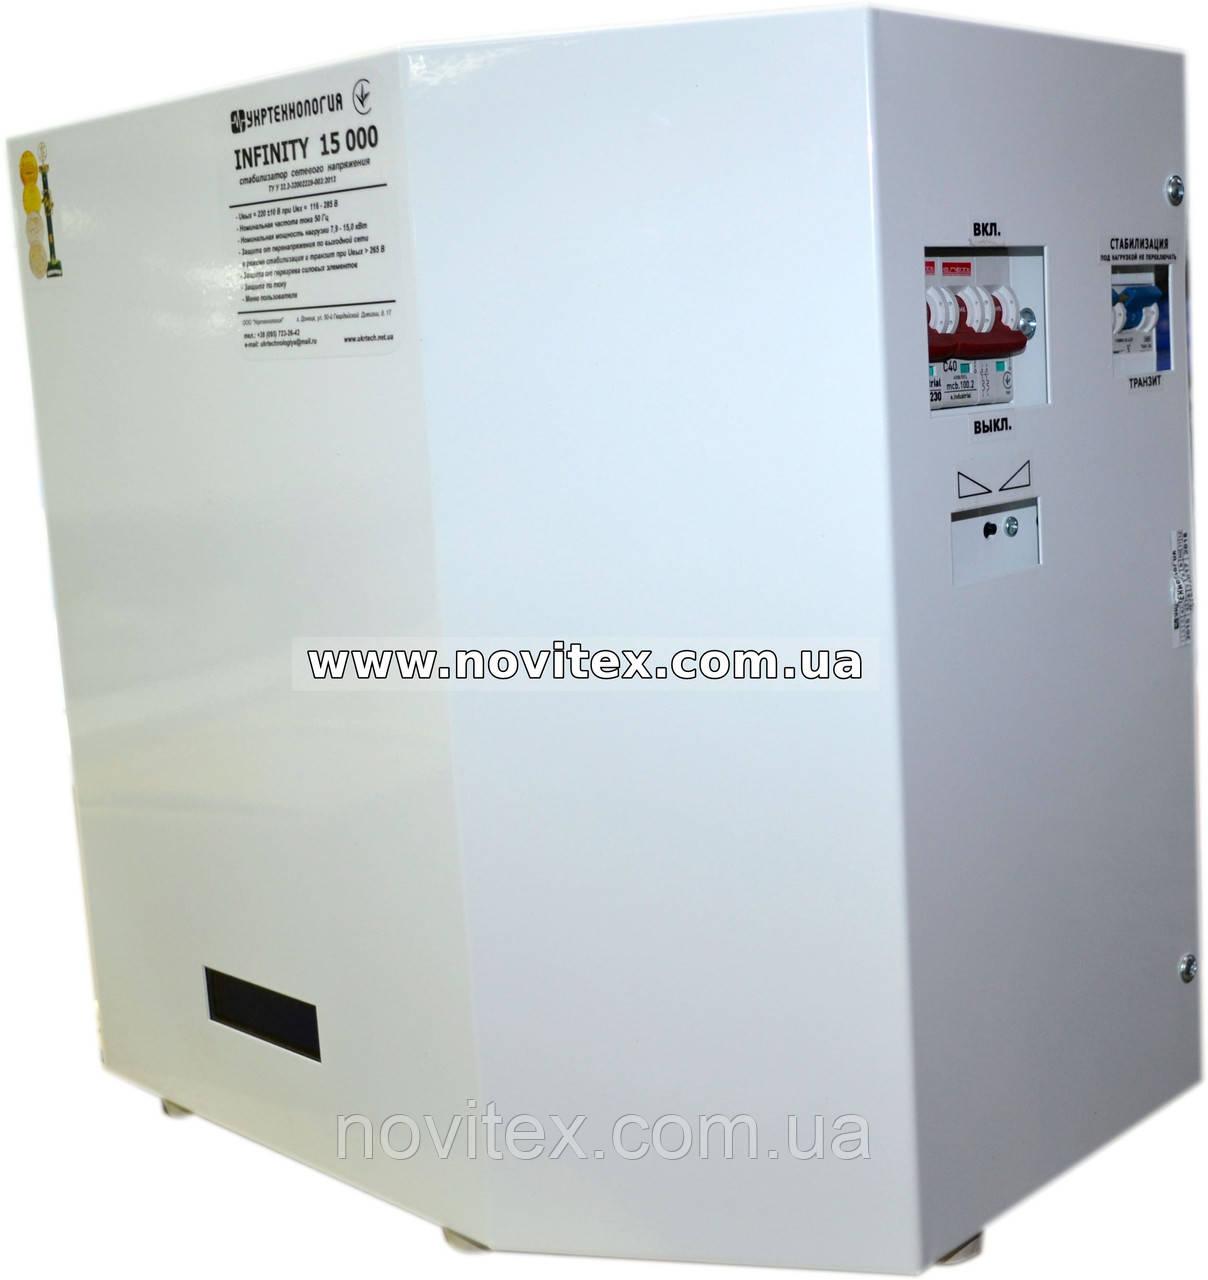 Стабилизатор Укртехнология НСН Infinity 12000